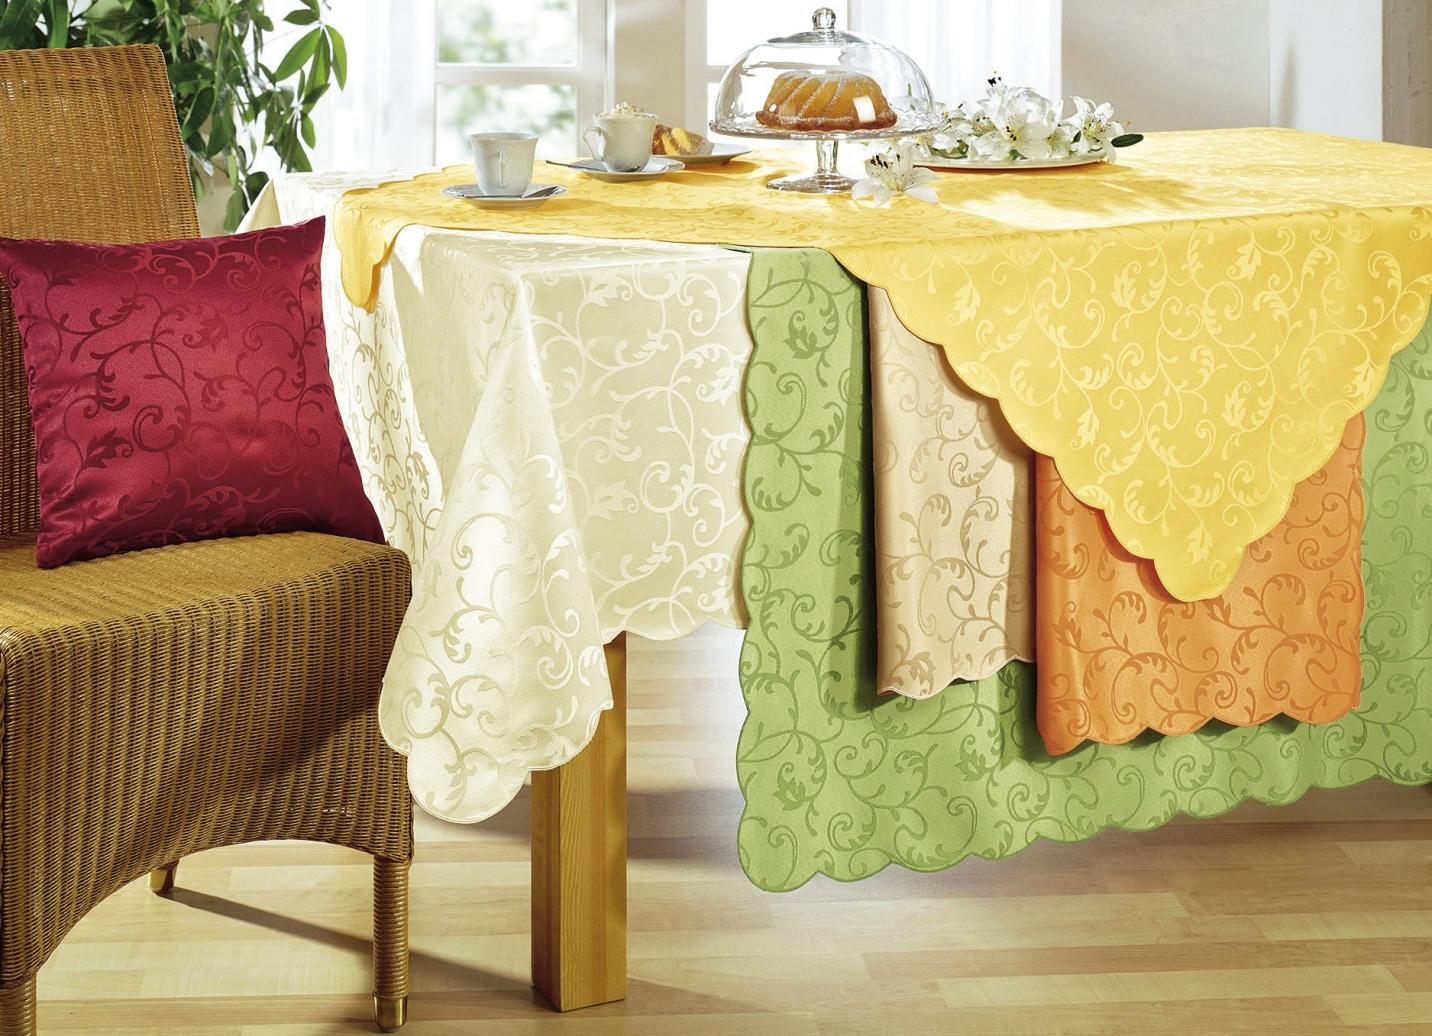 Gardinen deko bader mode gardinen gardinen dekoration for Gardinen bader